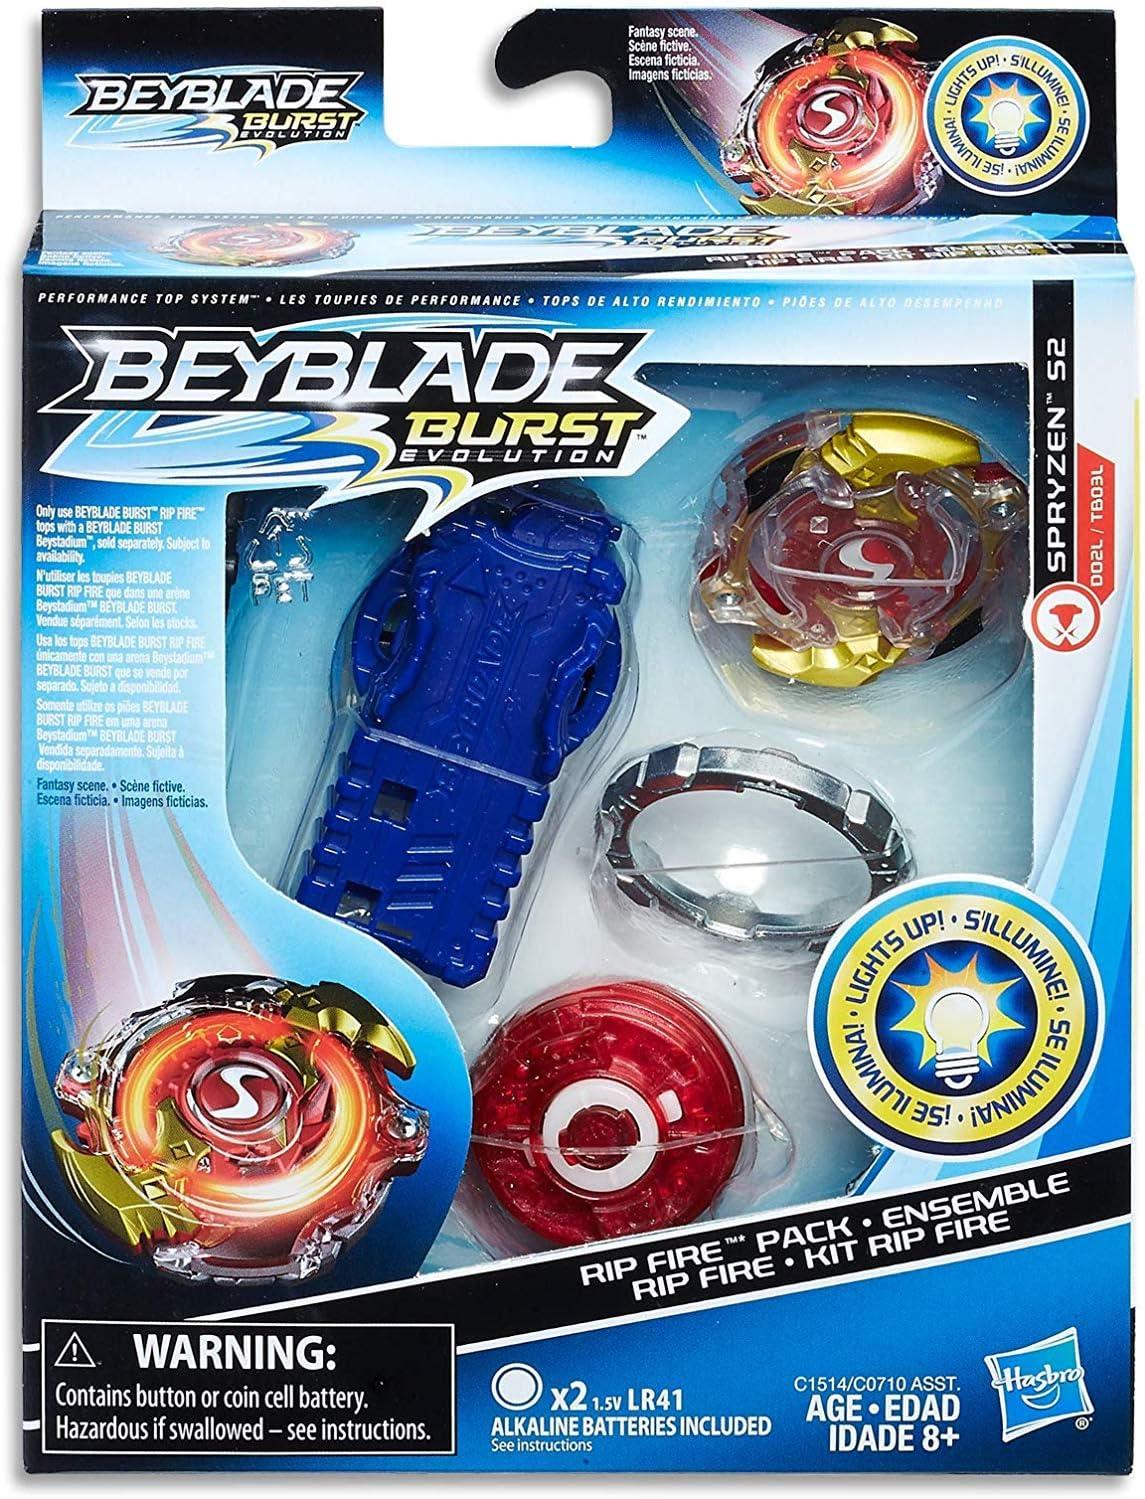 Beyblade Burst Evolution Starter Pack Choose from 4